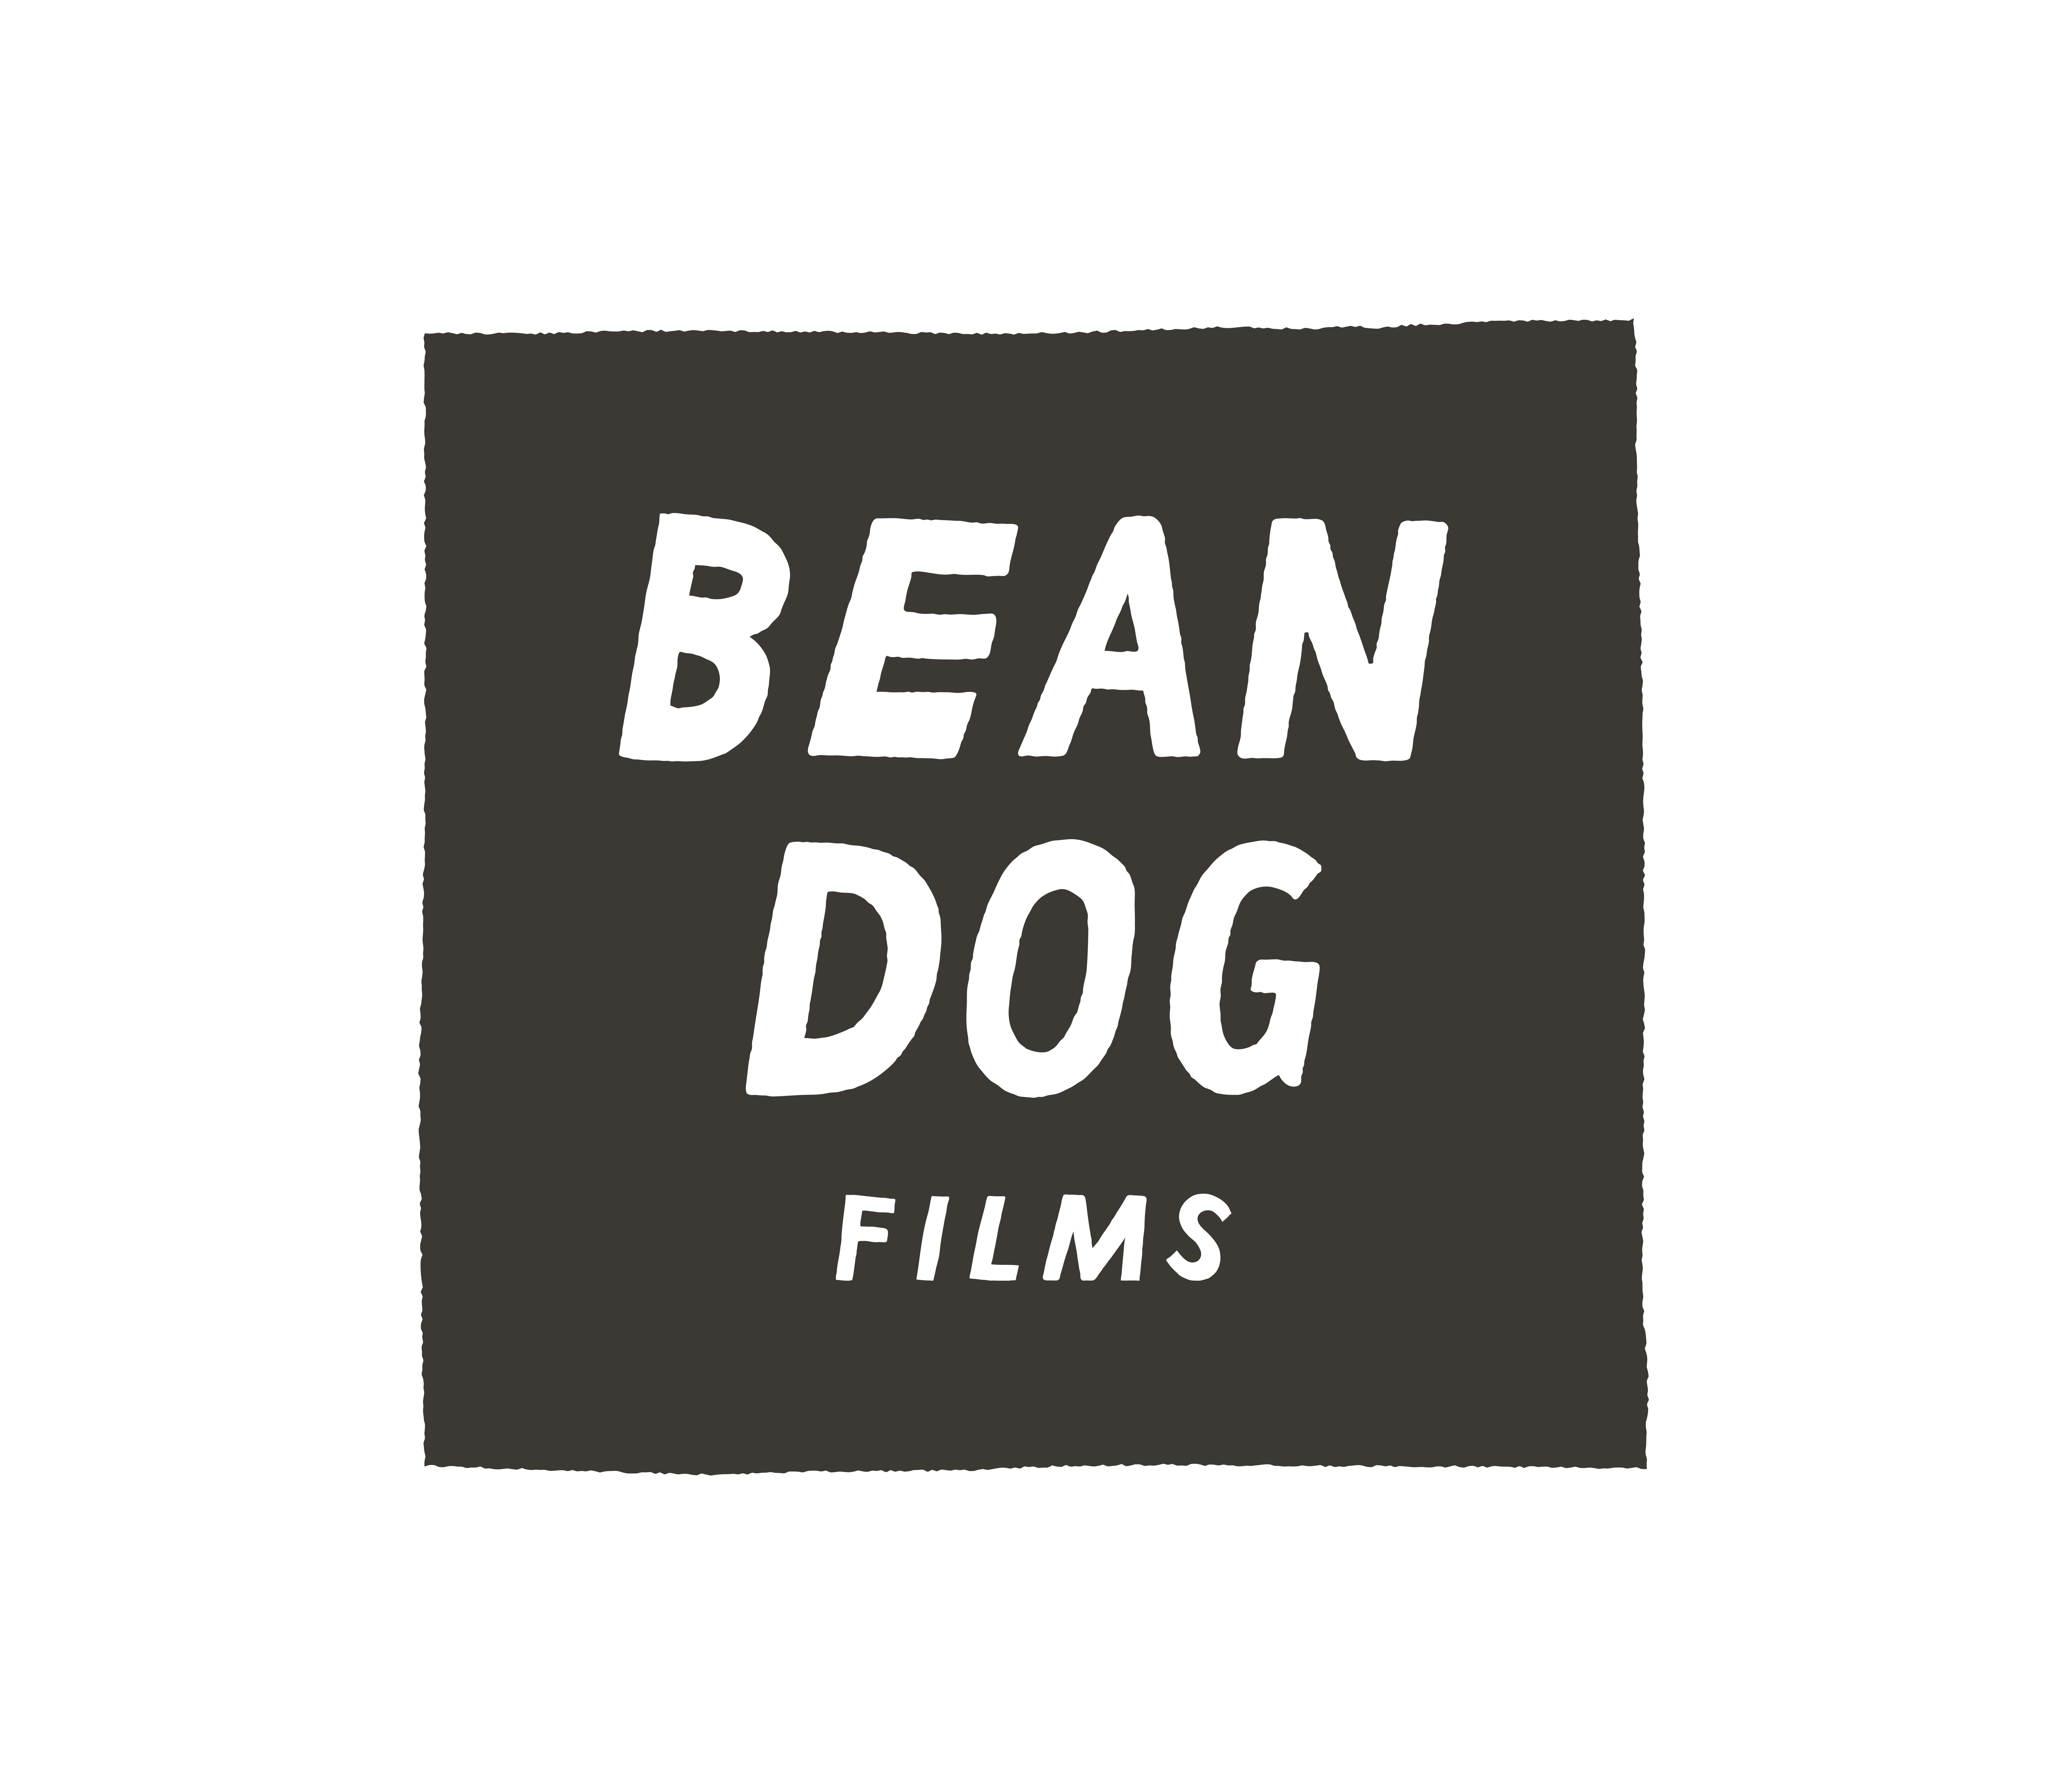 Bean Dog Films